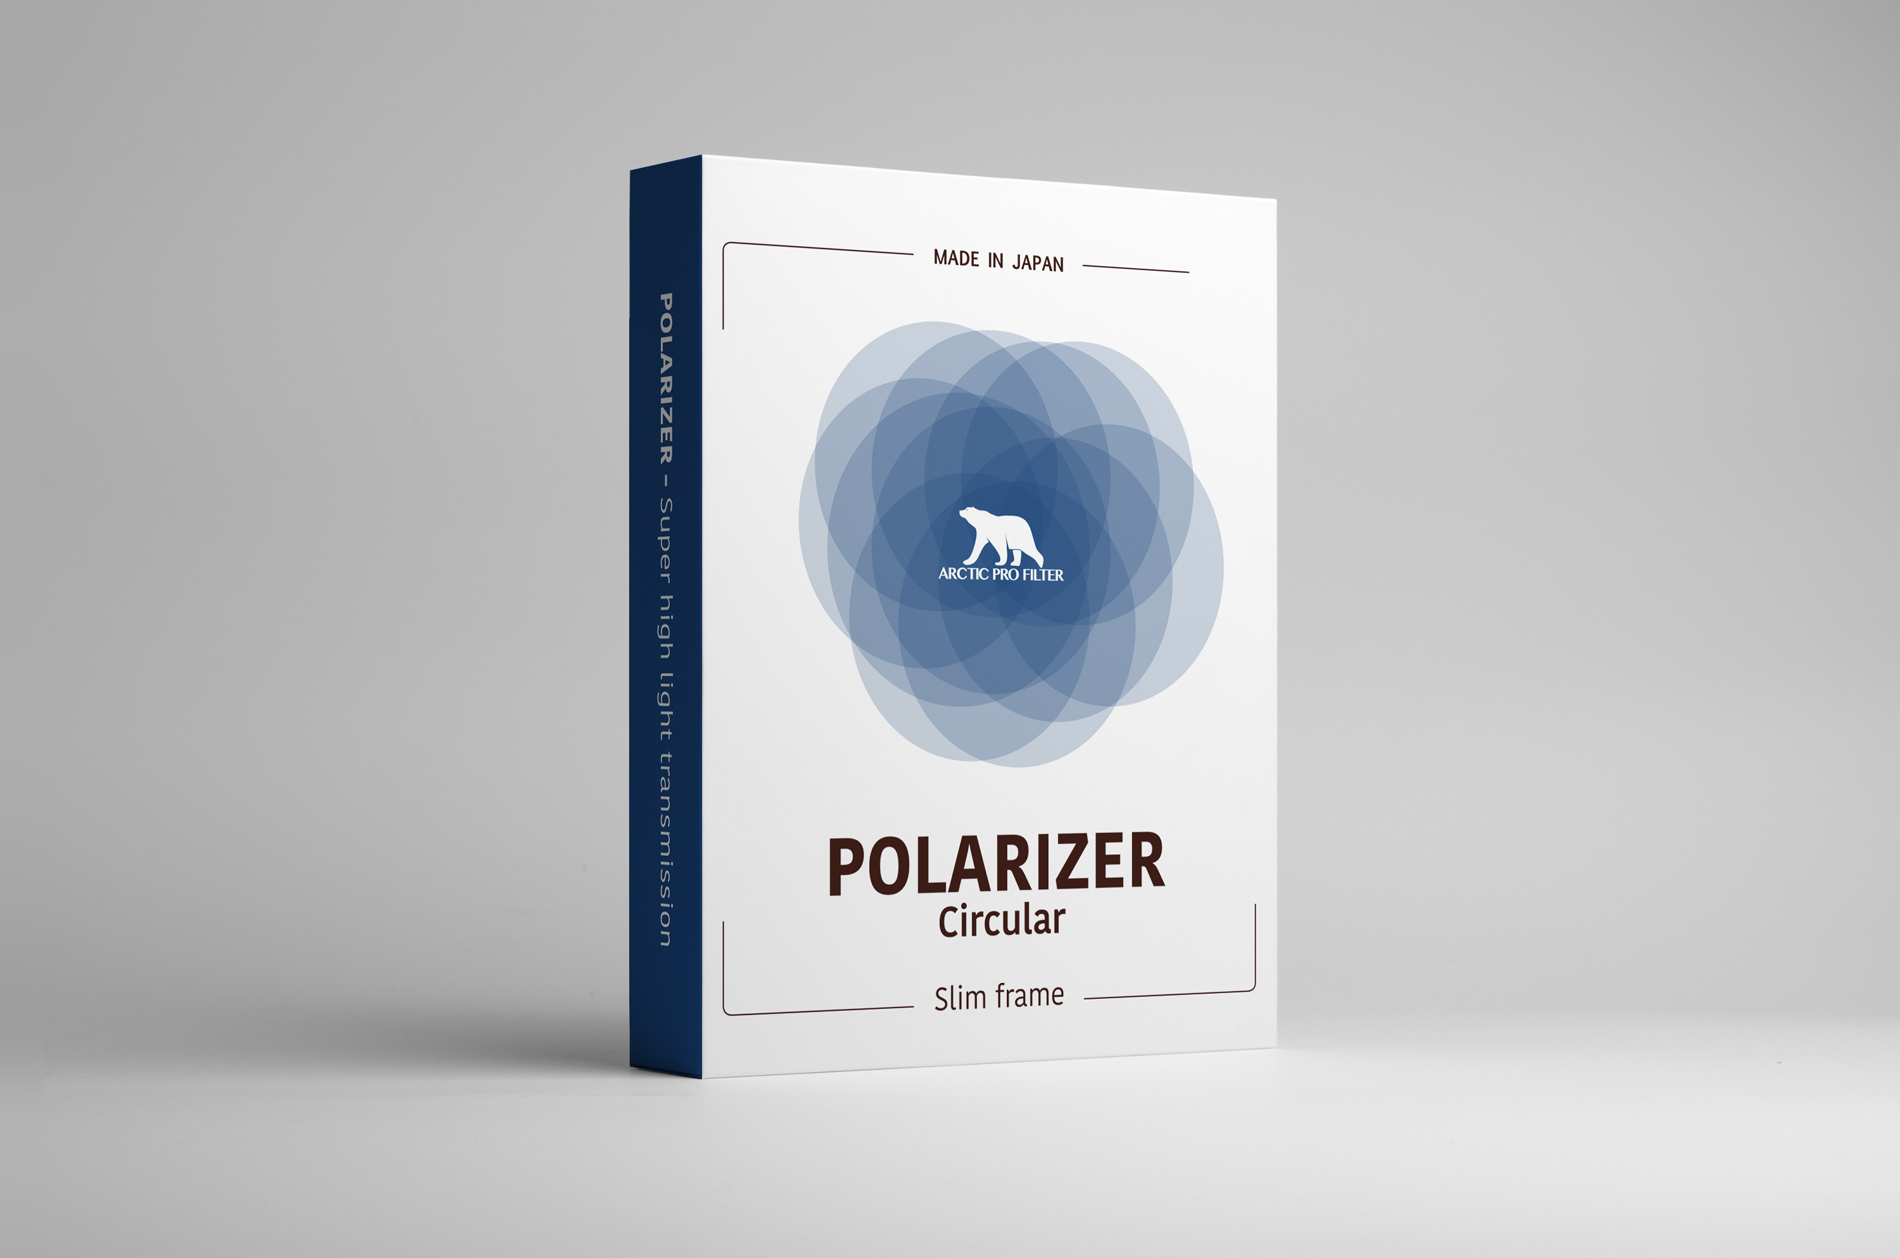 Arctic Pro Filter Polarizer